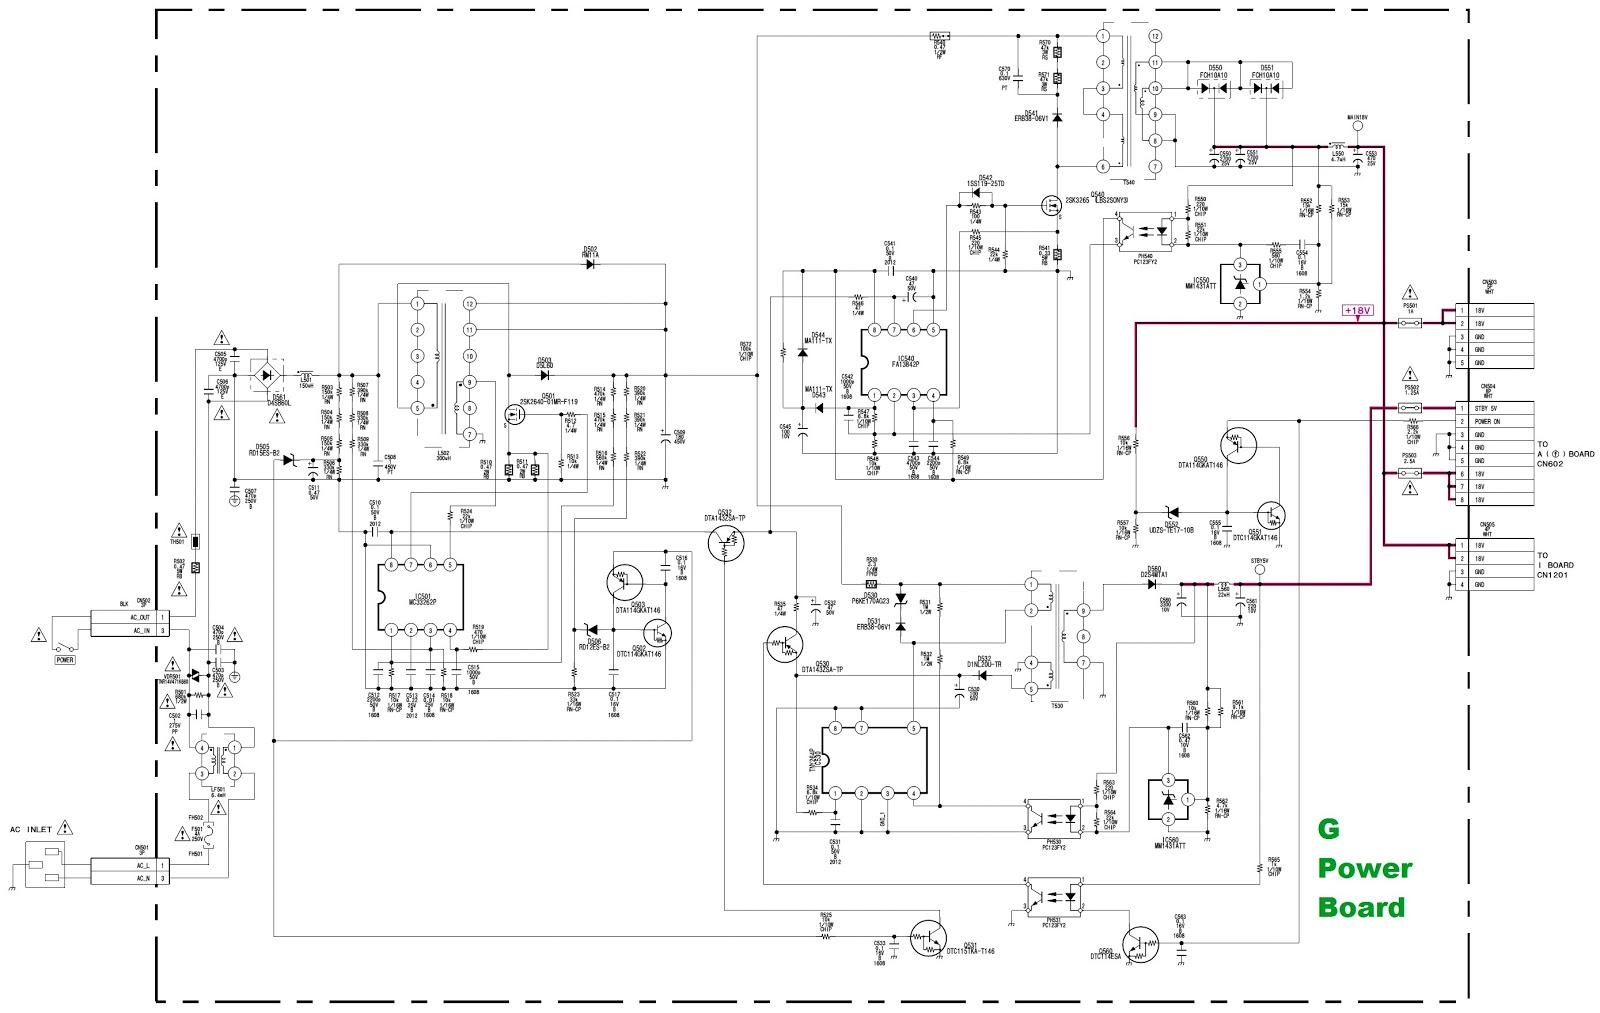 SONY SDM P232W LCD MONITOR SelfDiagnosis APQ Adjustment